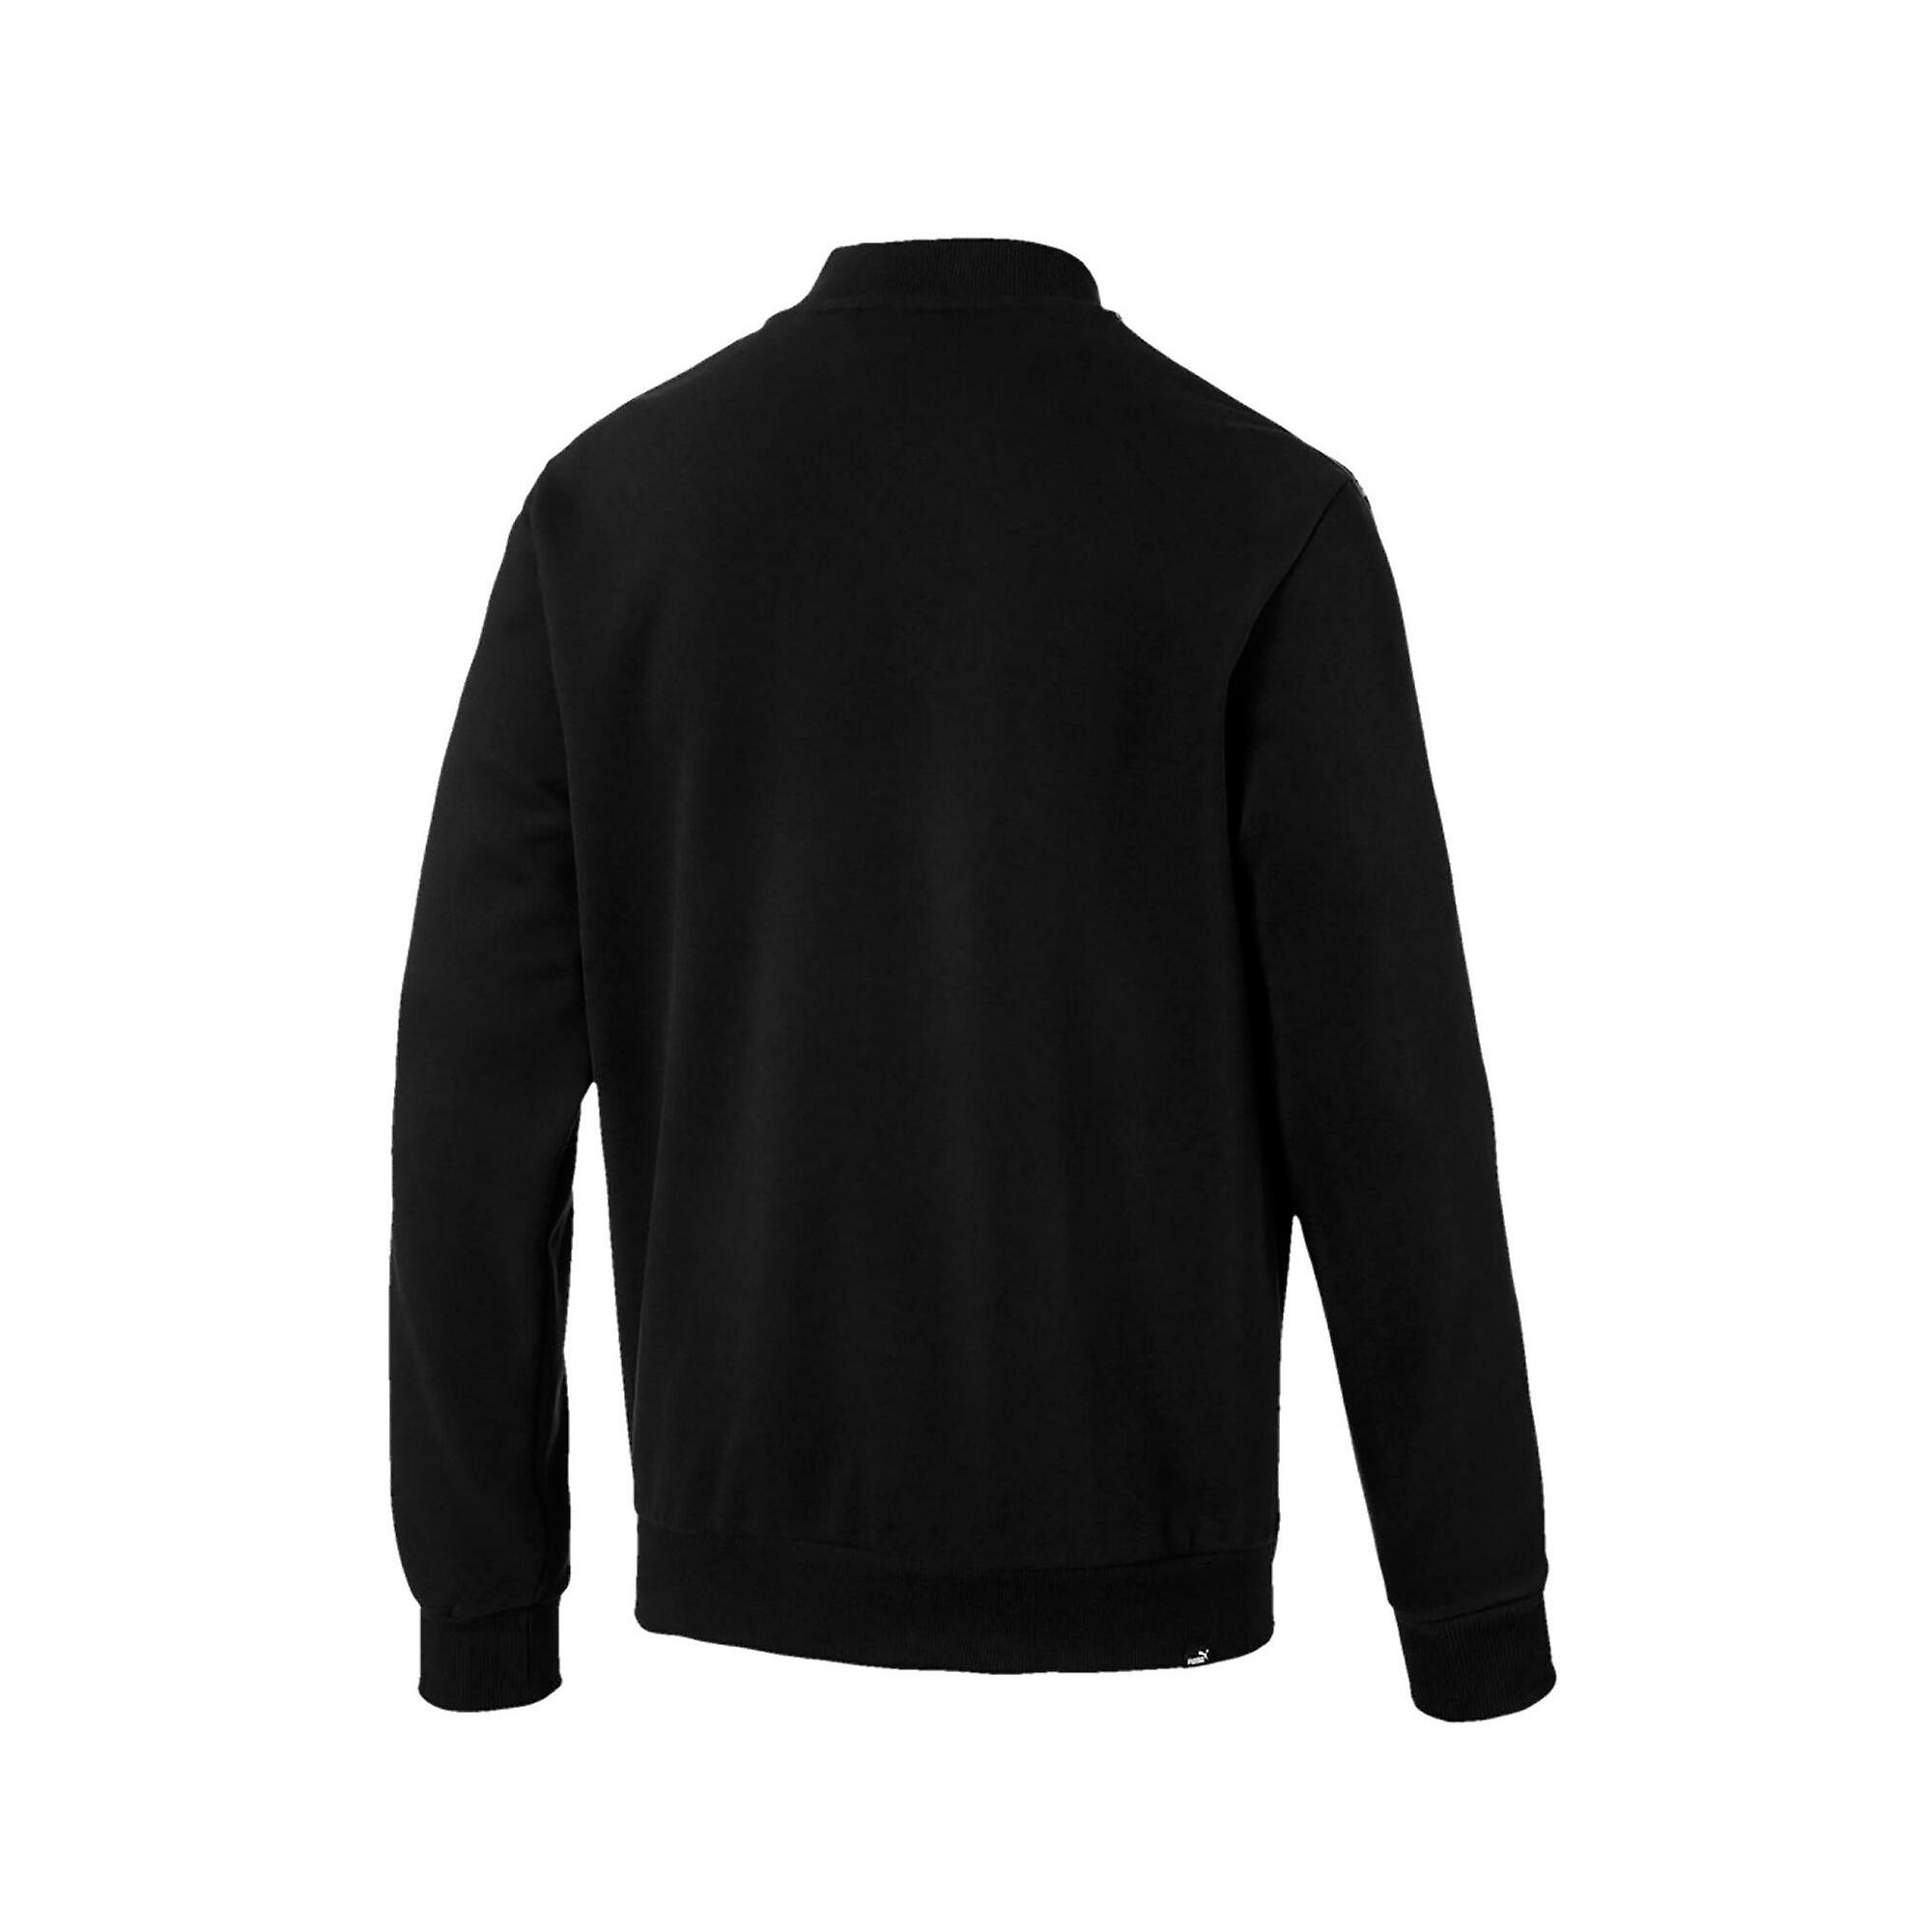 Puma Holiday Pack Mens Full Zip Fashion Casual Bomber Jacket Black